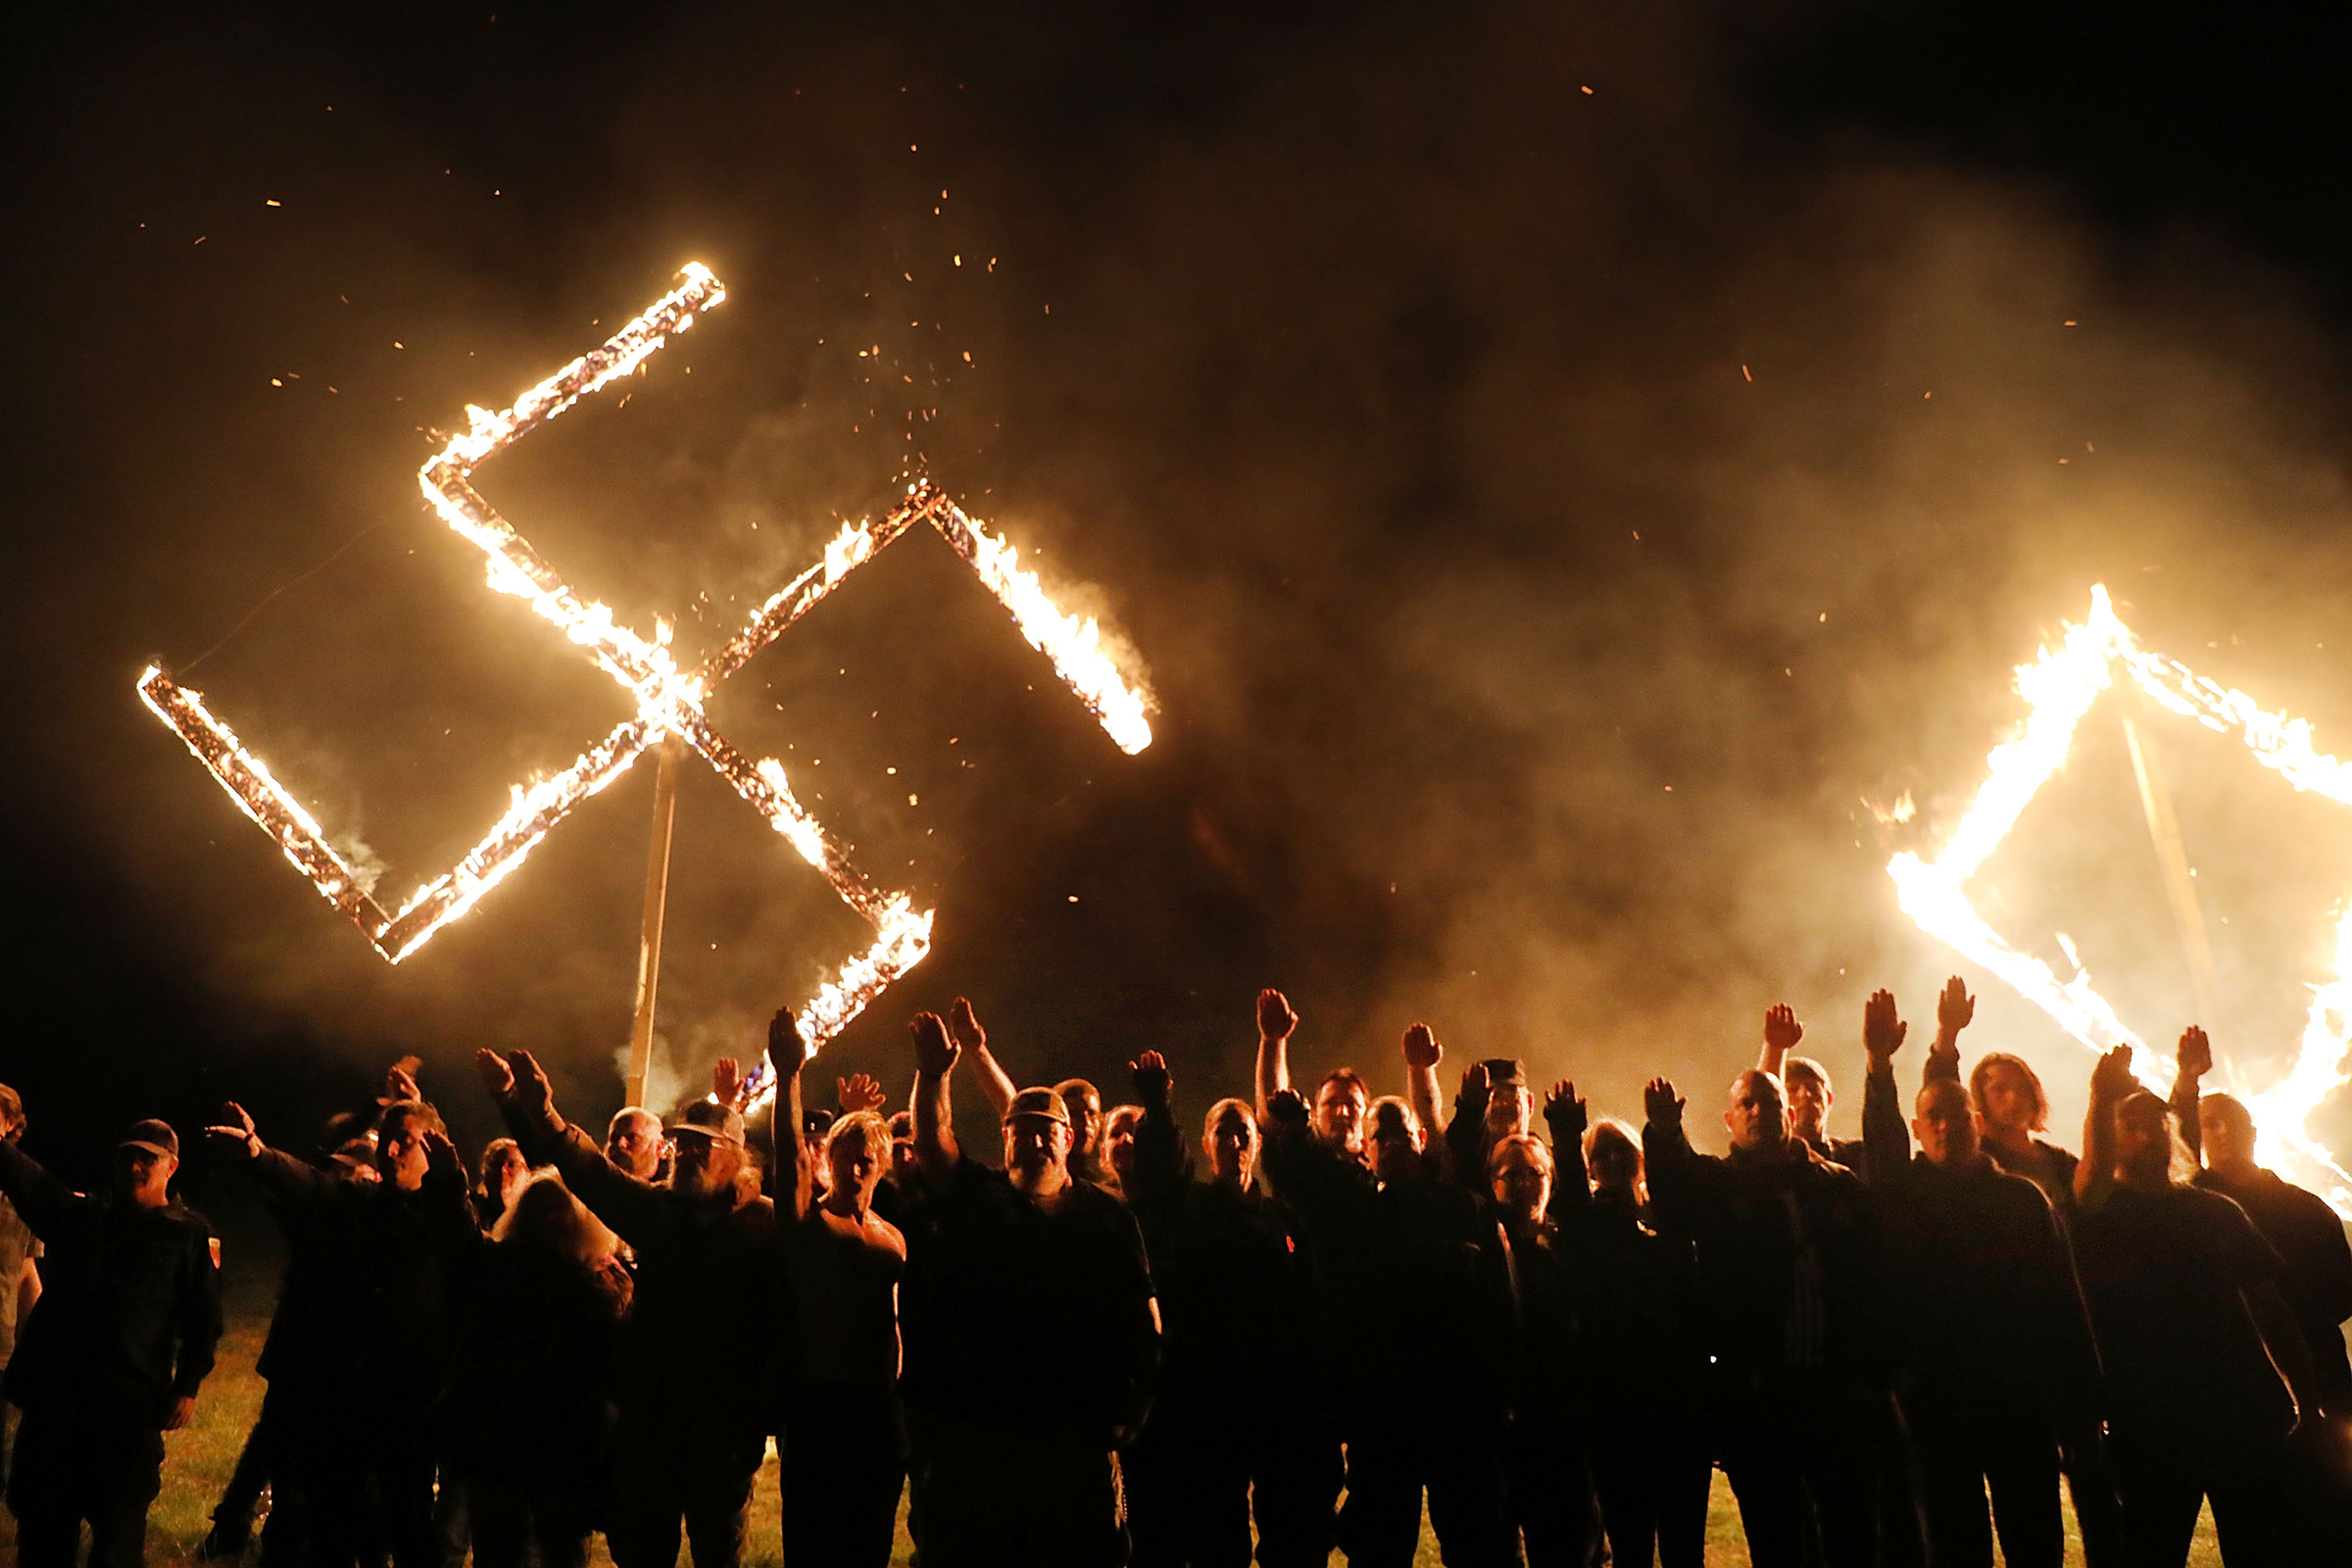 white supremacists giving Nazi salute with huge swastika burning